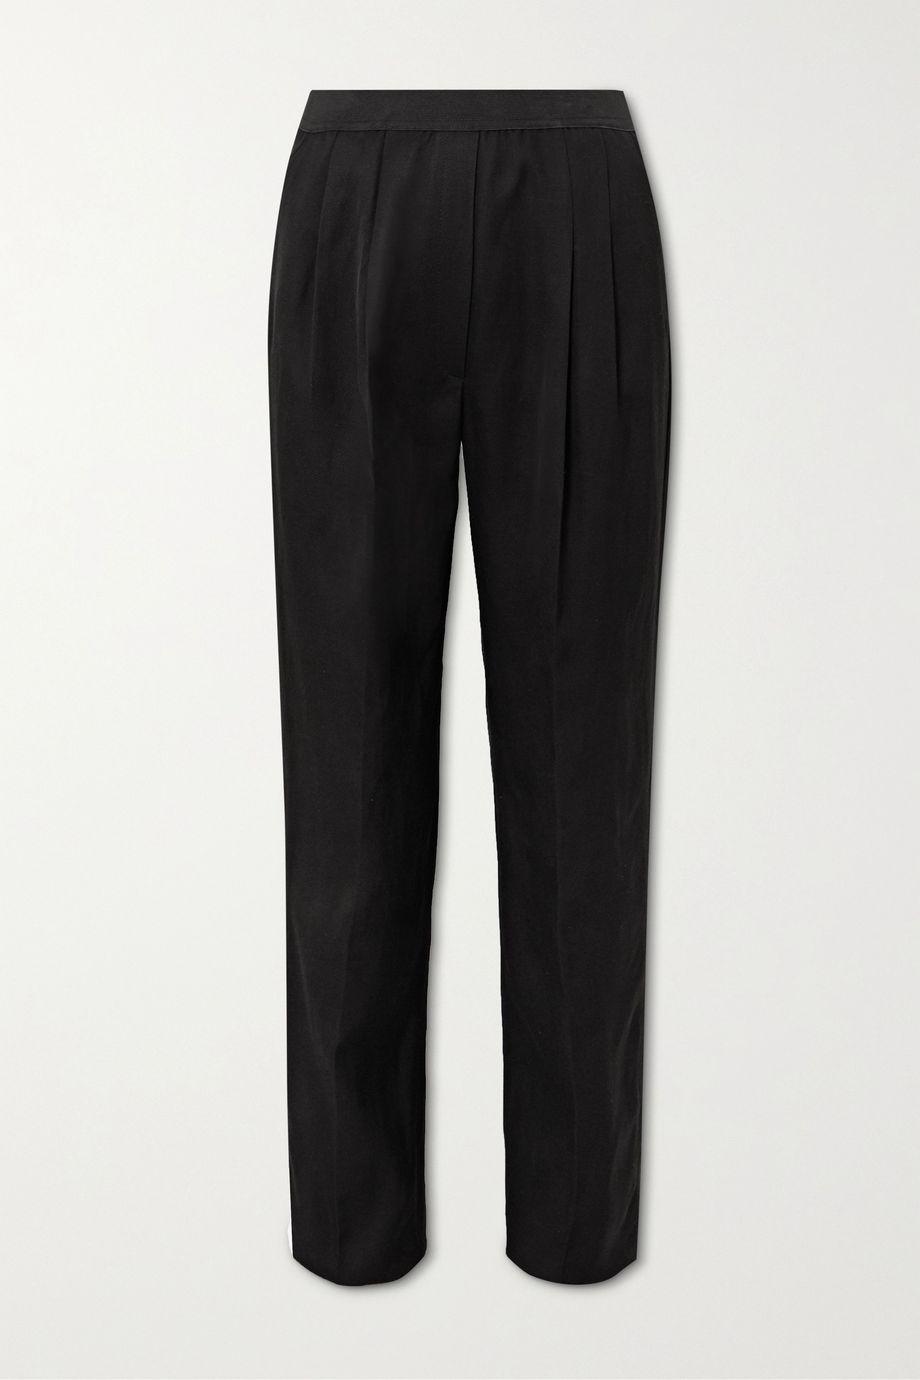 LOULOU STUDIO Takaroa pleated twill straight-leg pants